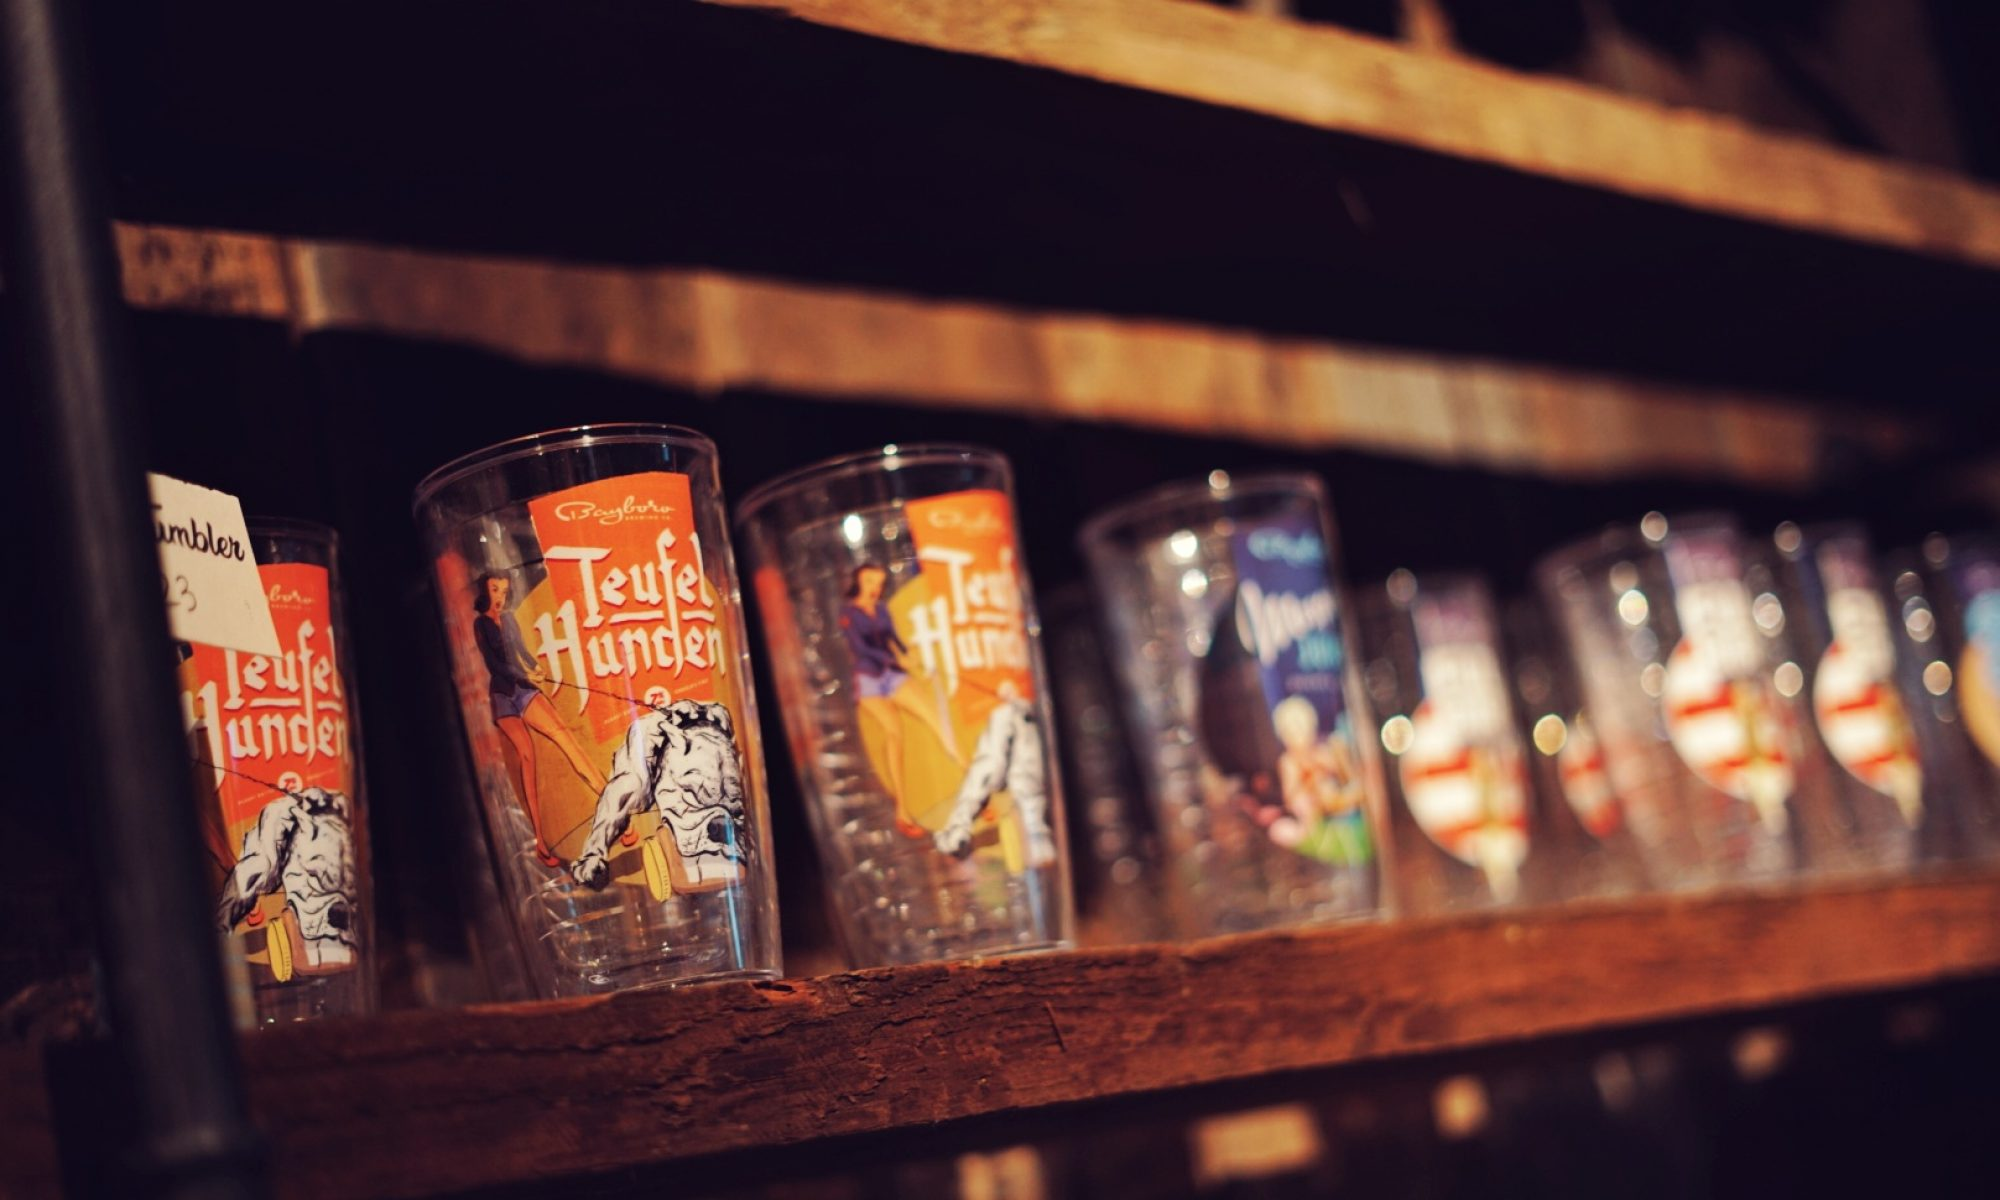 Local Brewery & Tasting Room